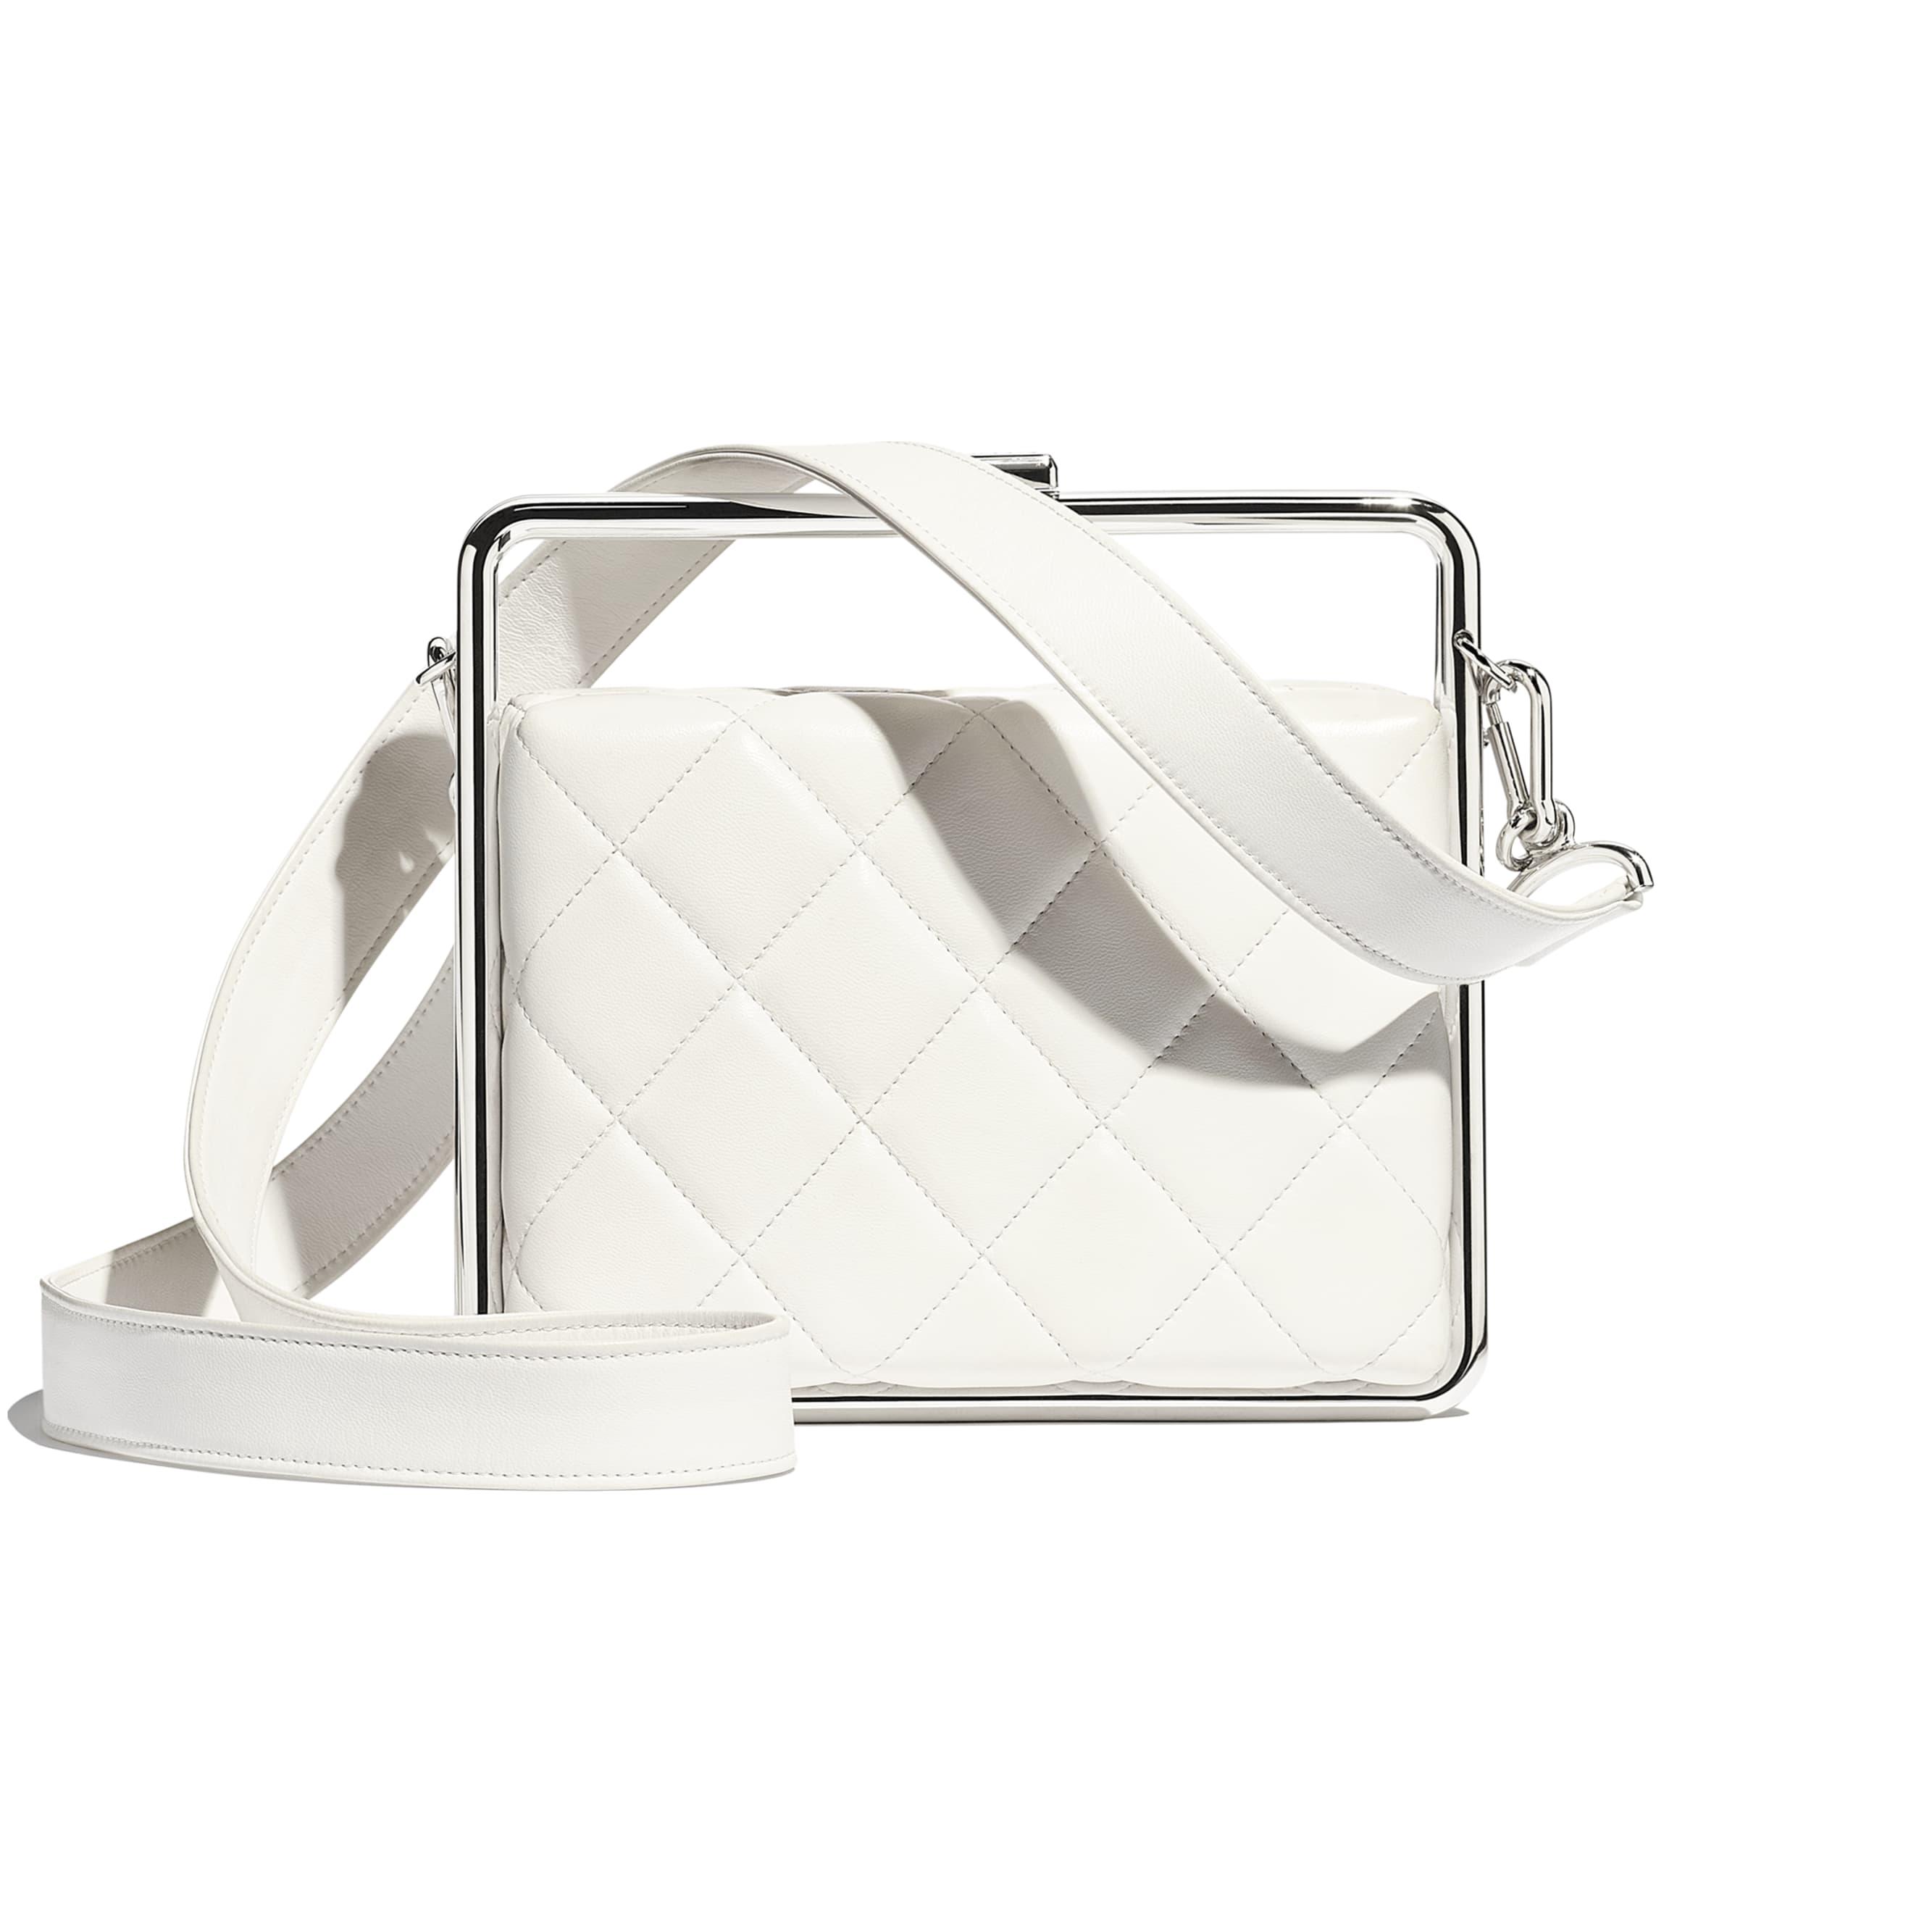 Clutch - White - Lambskin & Silver-Tone Metal - CHANEL - Alternative view - see standard sized version